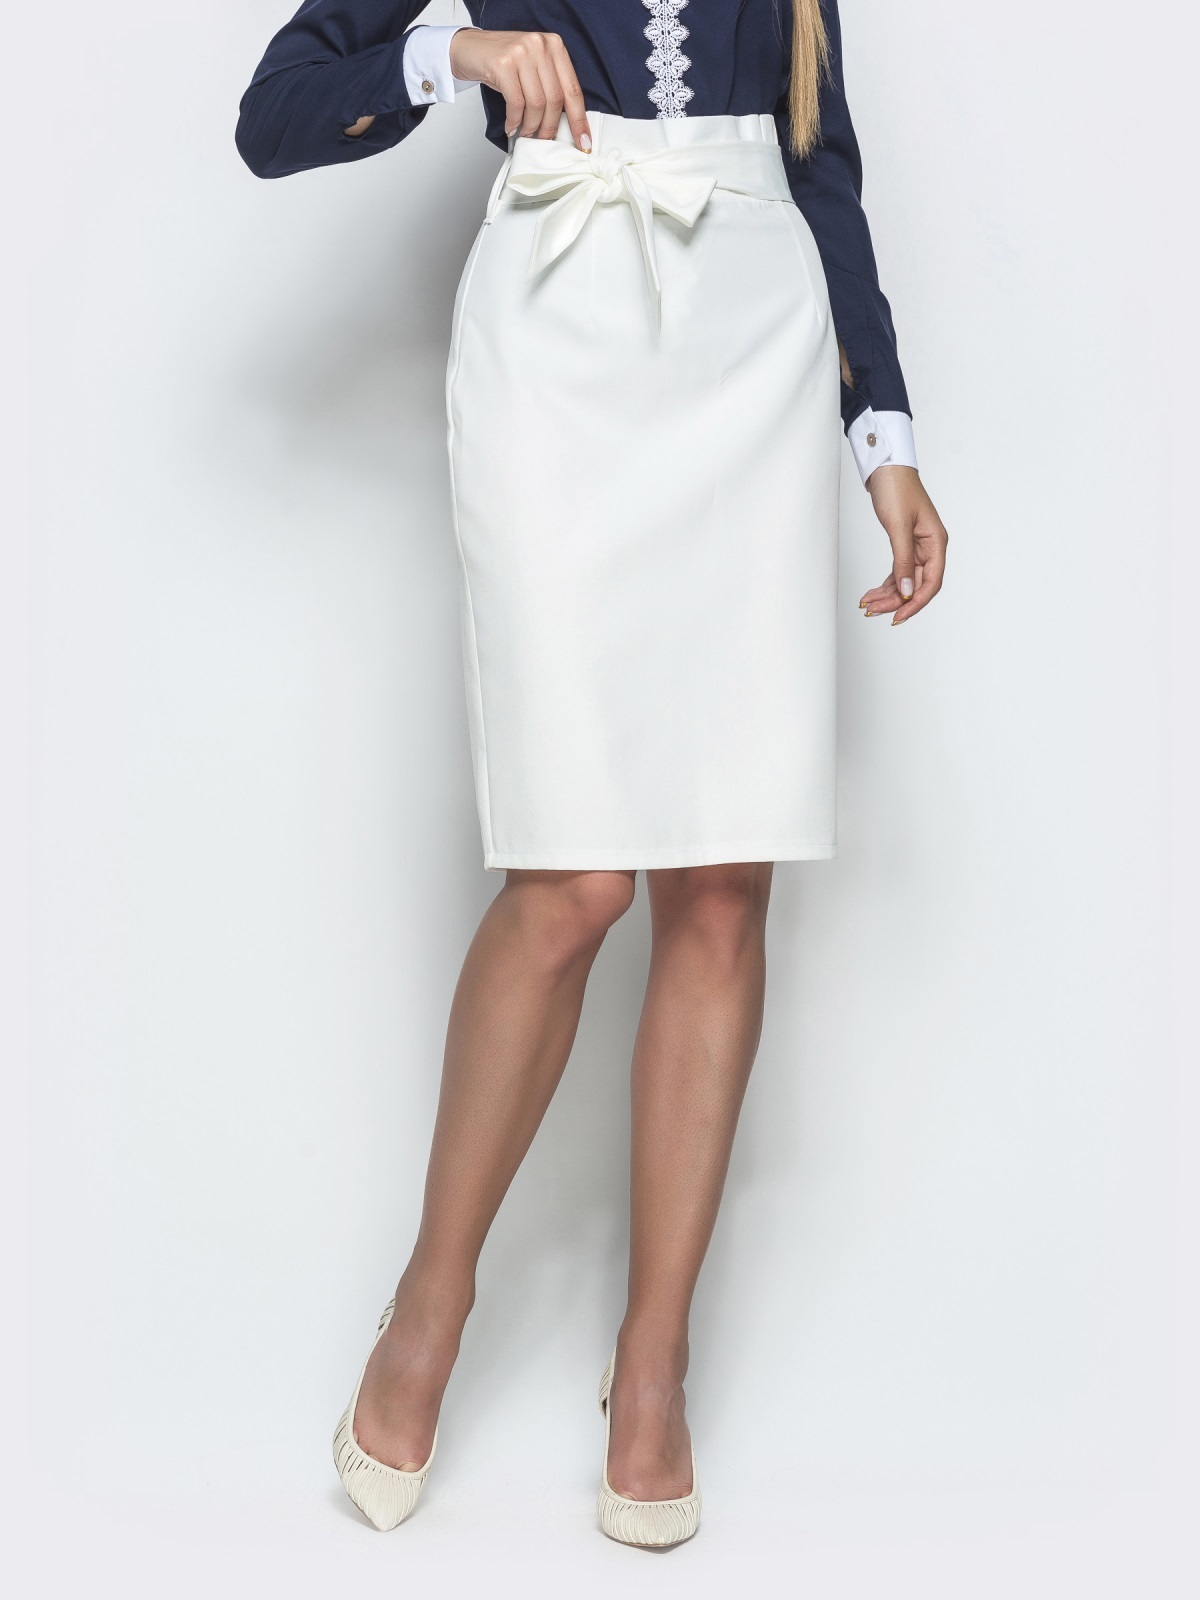 Белая юбка-карандаш с оборкой по талии - 39772, фото 1 – интернет-магазин Dressa